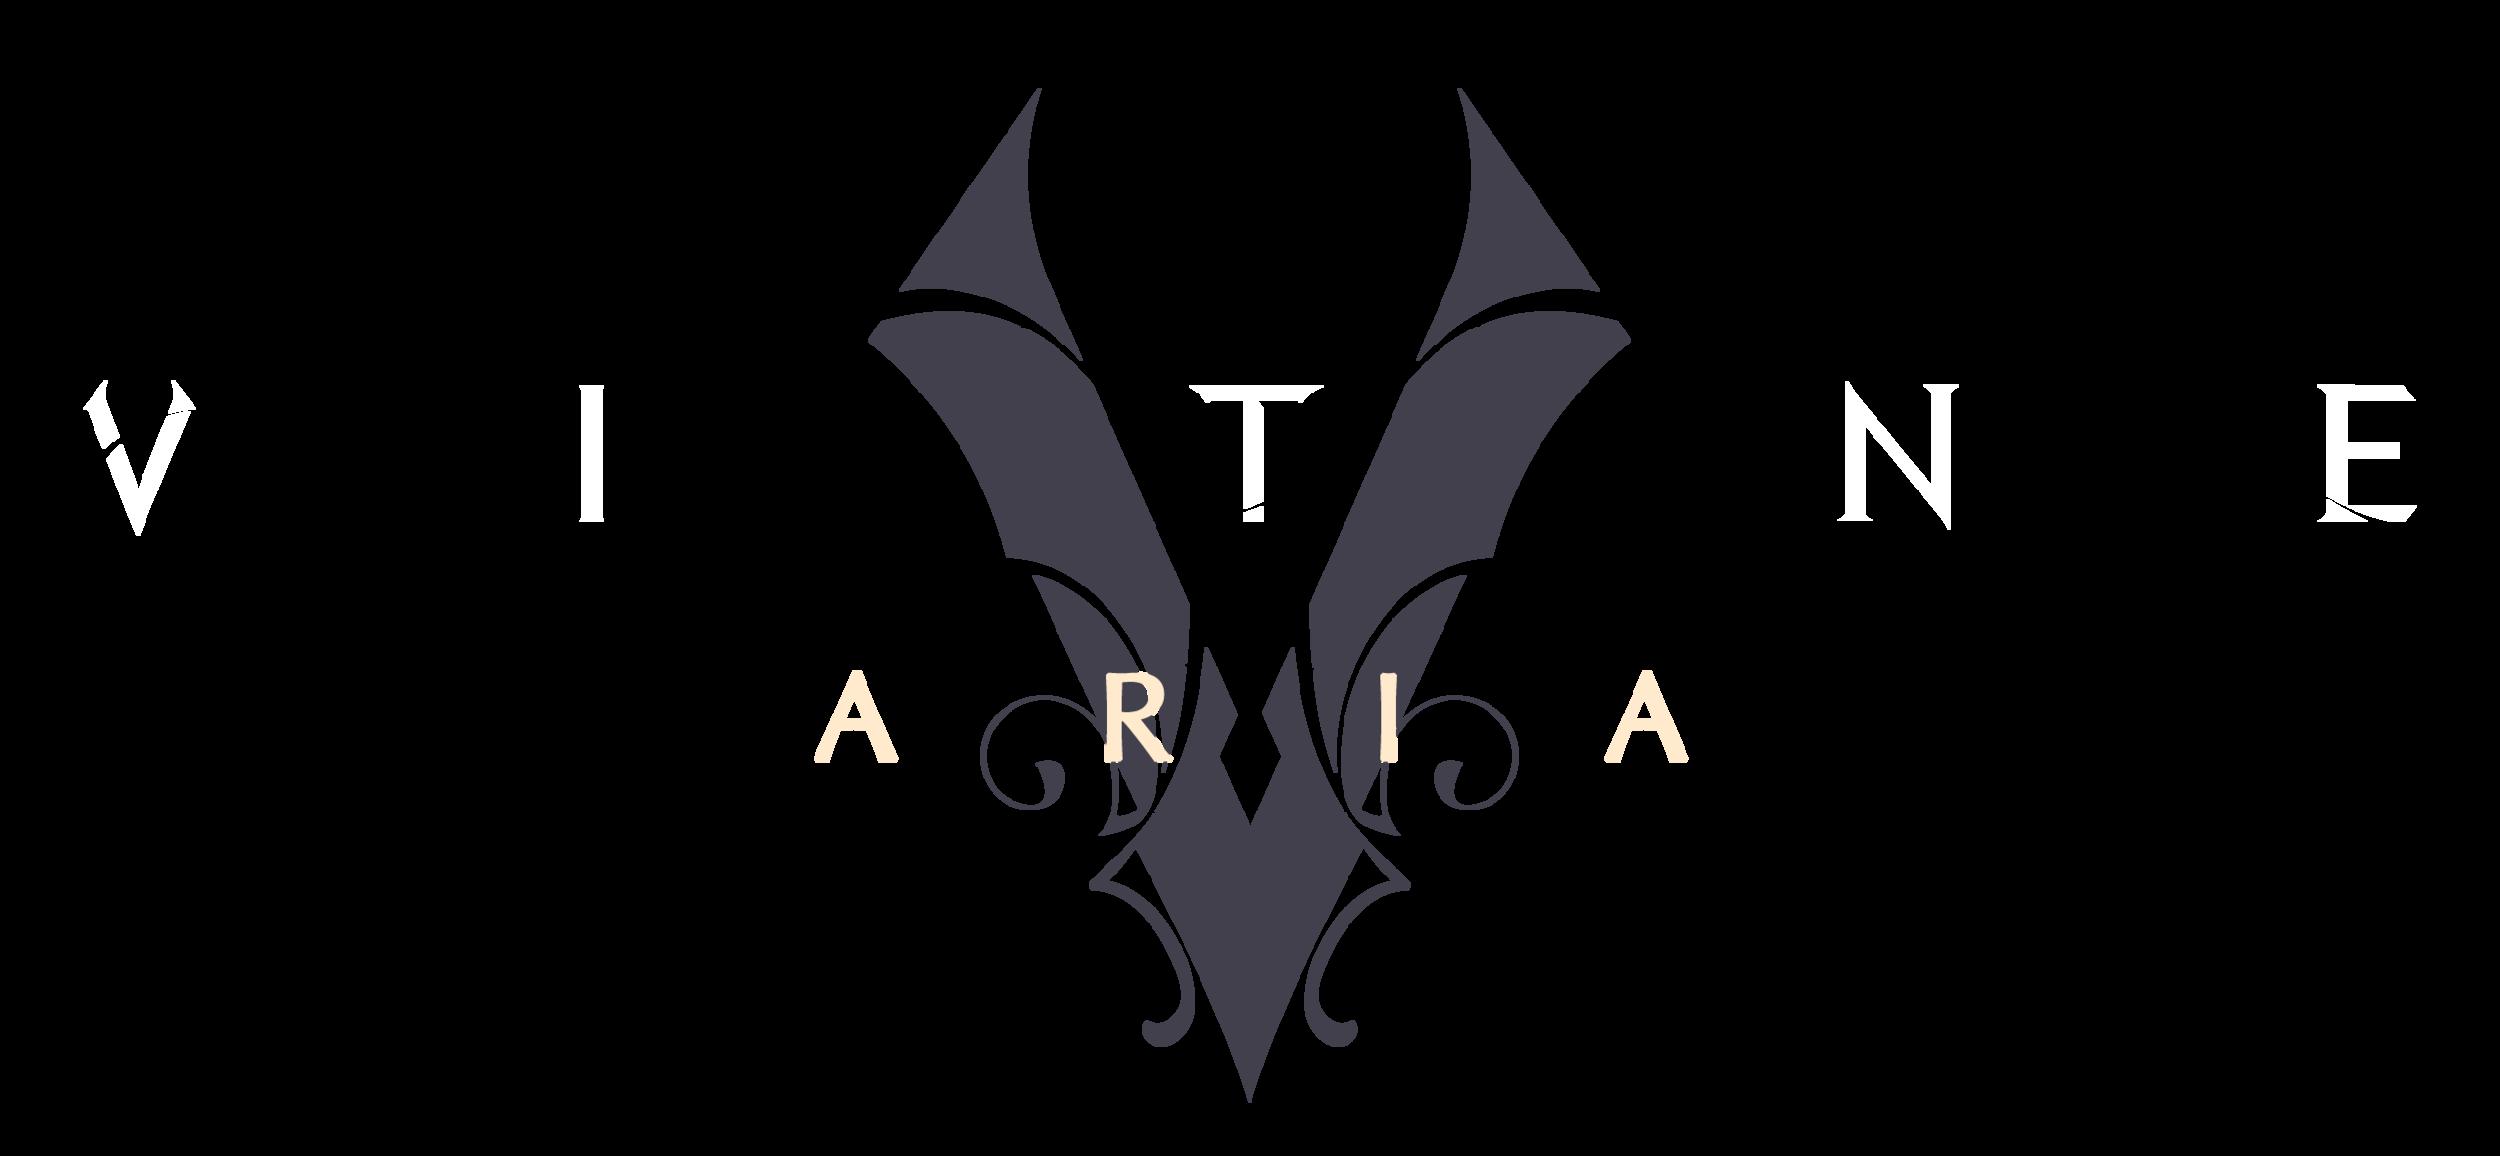 VITNE-Aria-Logo-nosolar.png